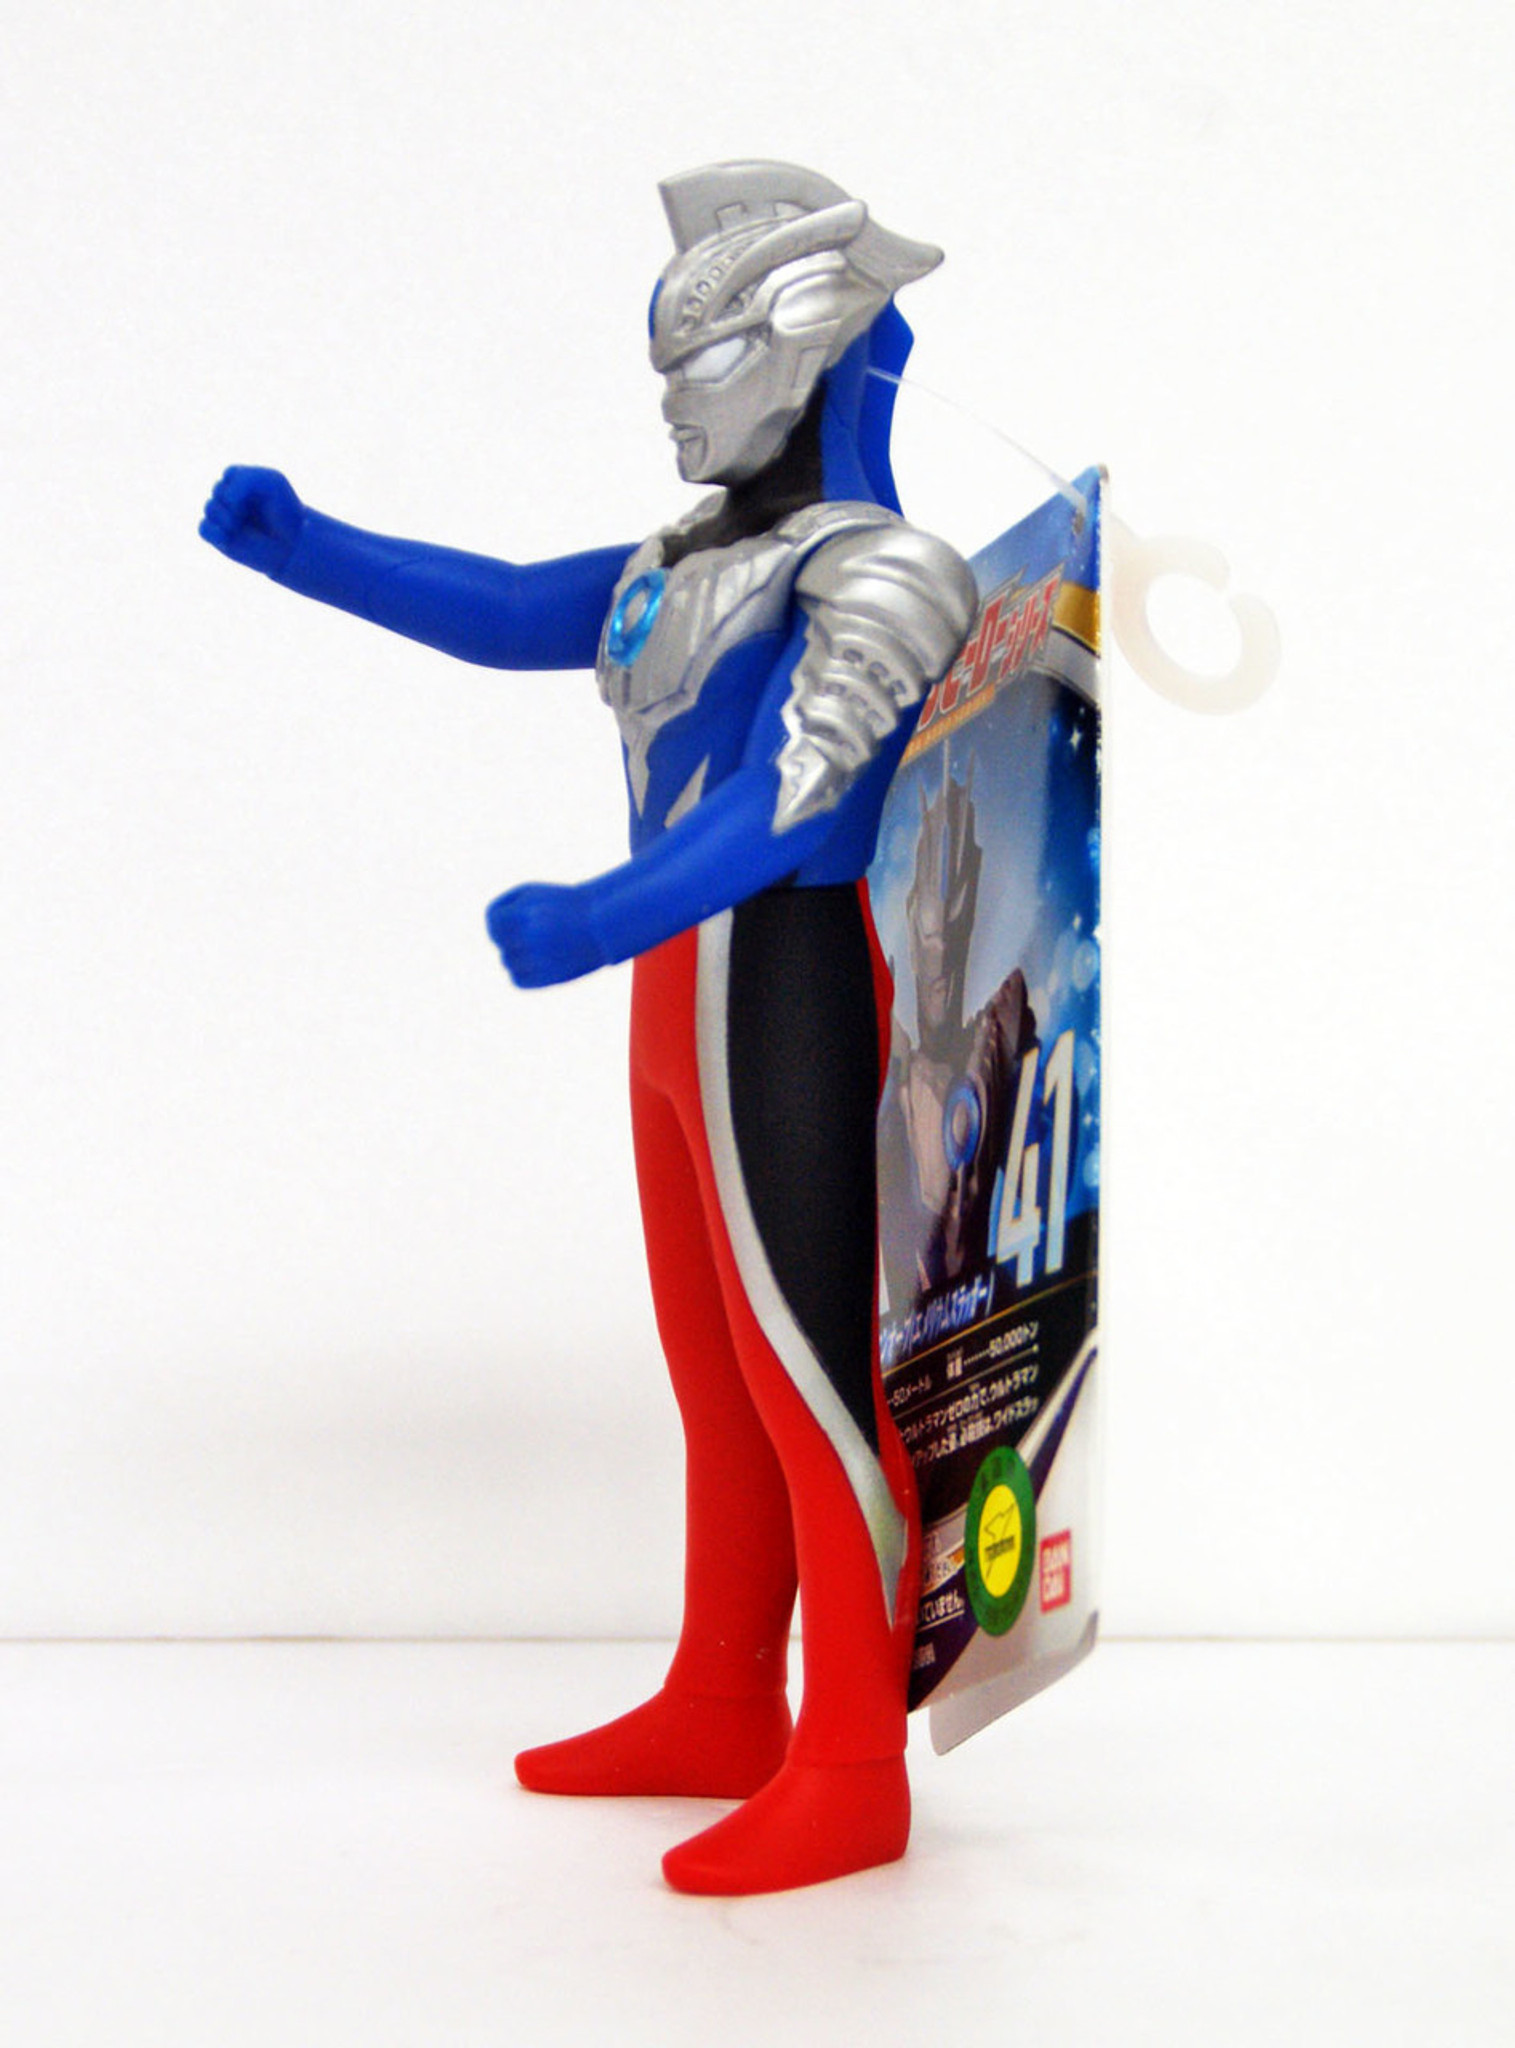 03 Ultraman Orb Vs Maga Jappa Youtube Ultraman Orb Api